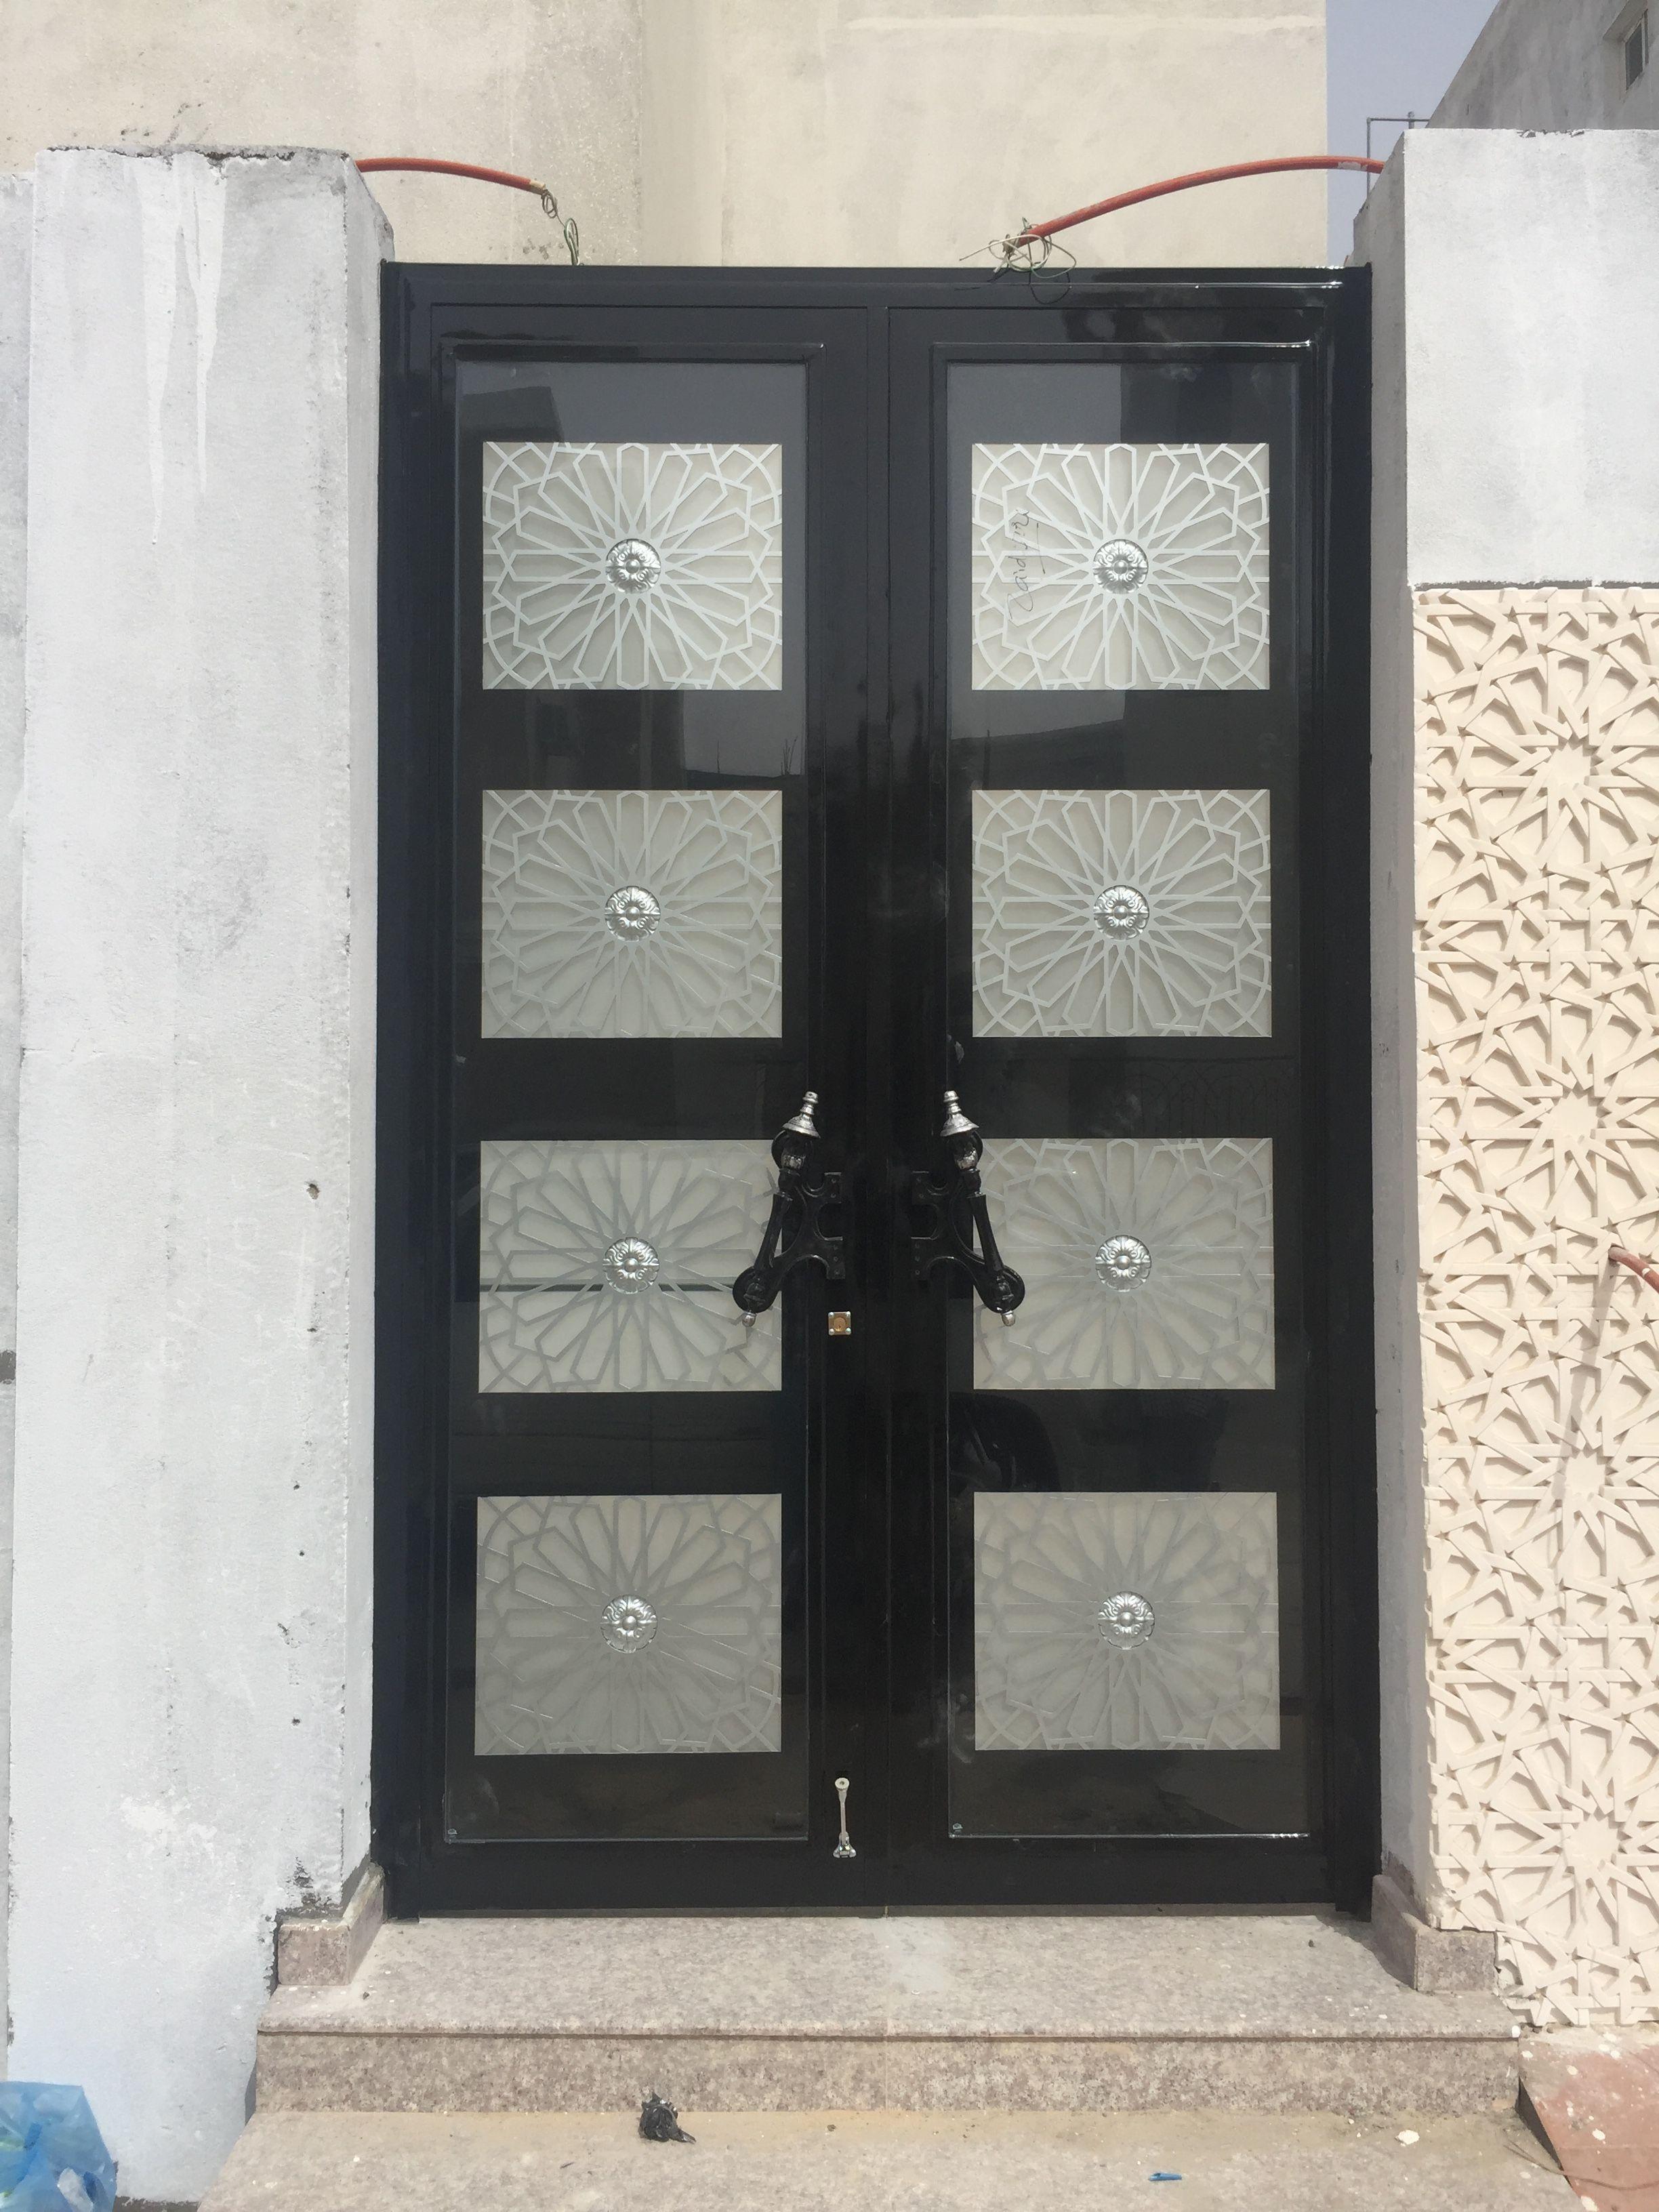 Pin By ابواب درج حديد القصور الذهبية On ابواب خارجية Home Decor China Cabinet Decor